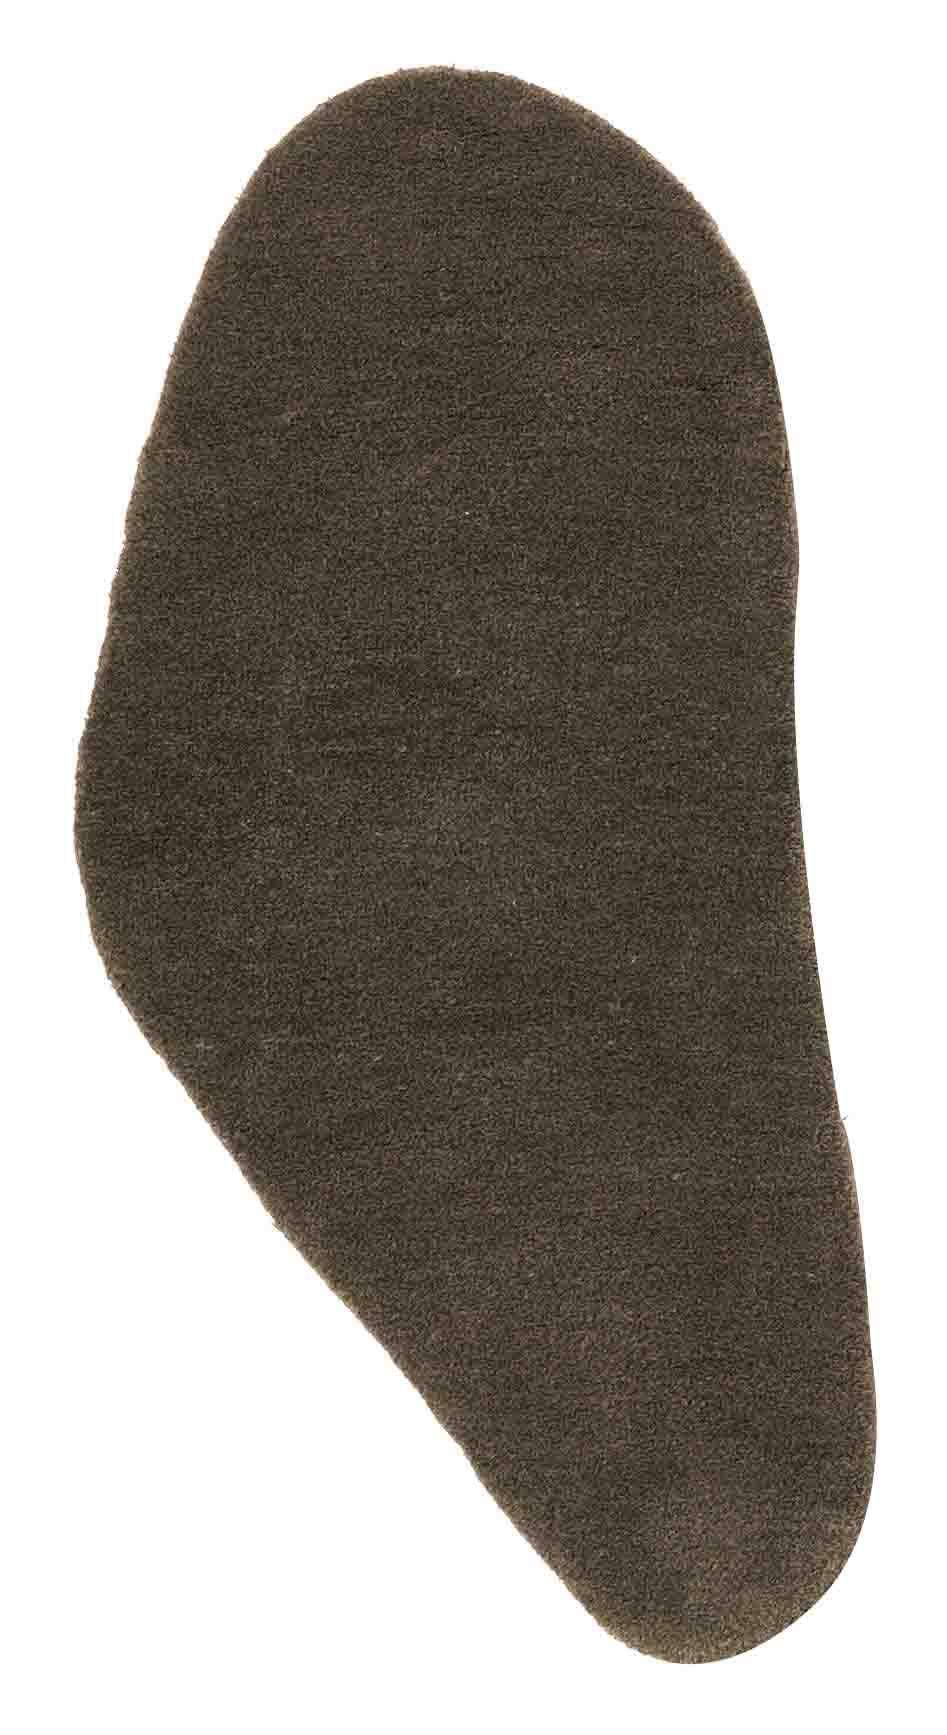 Mobilier - Tapis - Tapis Little Stone 11 / 55 x 110 cm - Nanimarquina - 55 x 110 cm - Gris-ardoise - Laine